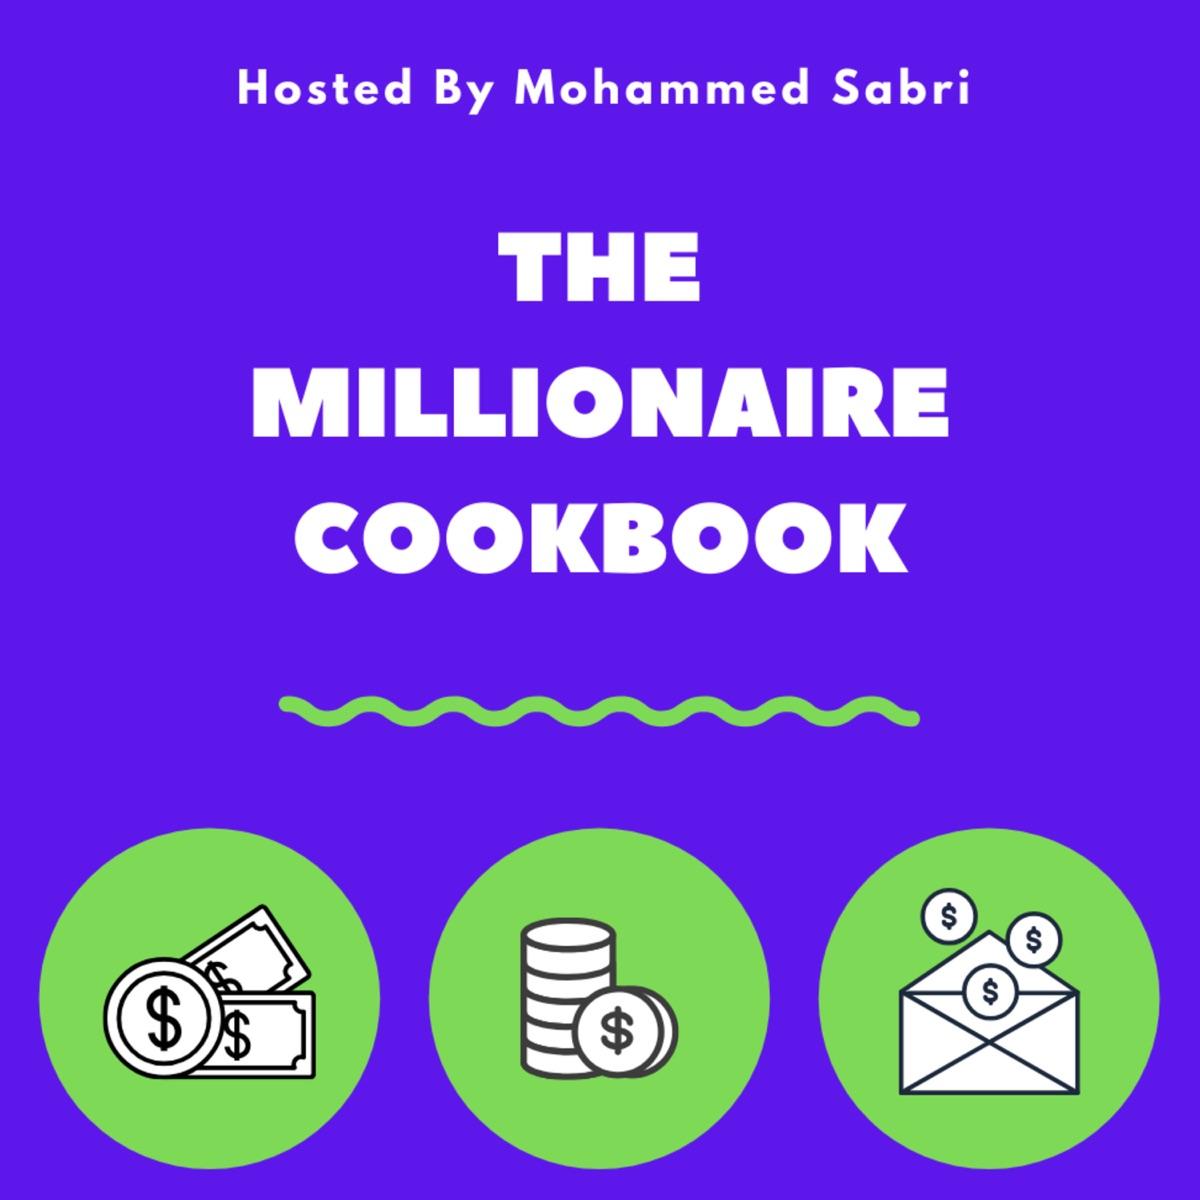 The Millionaire Cookbook